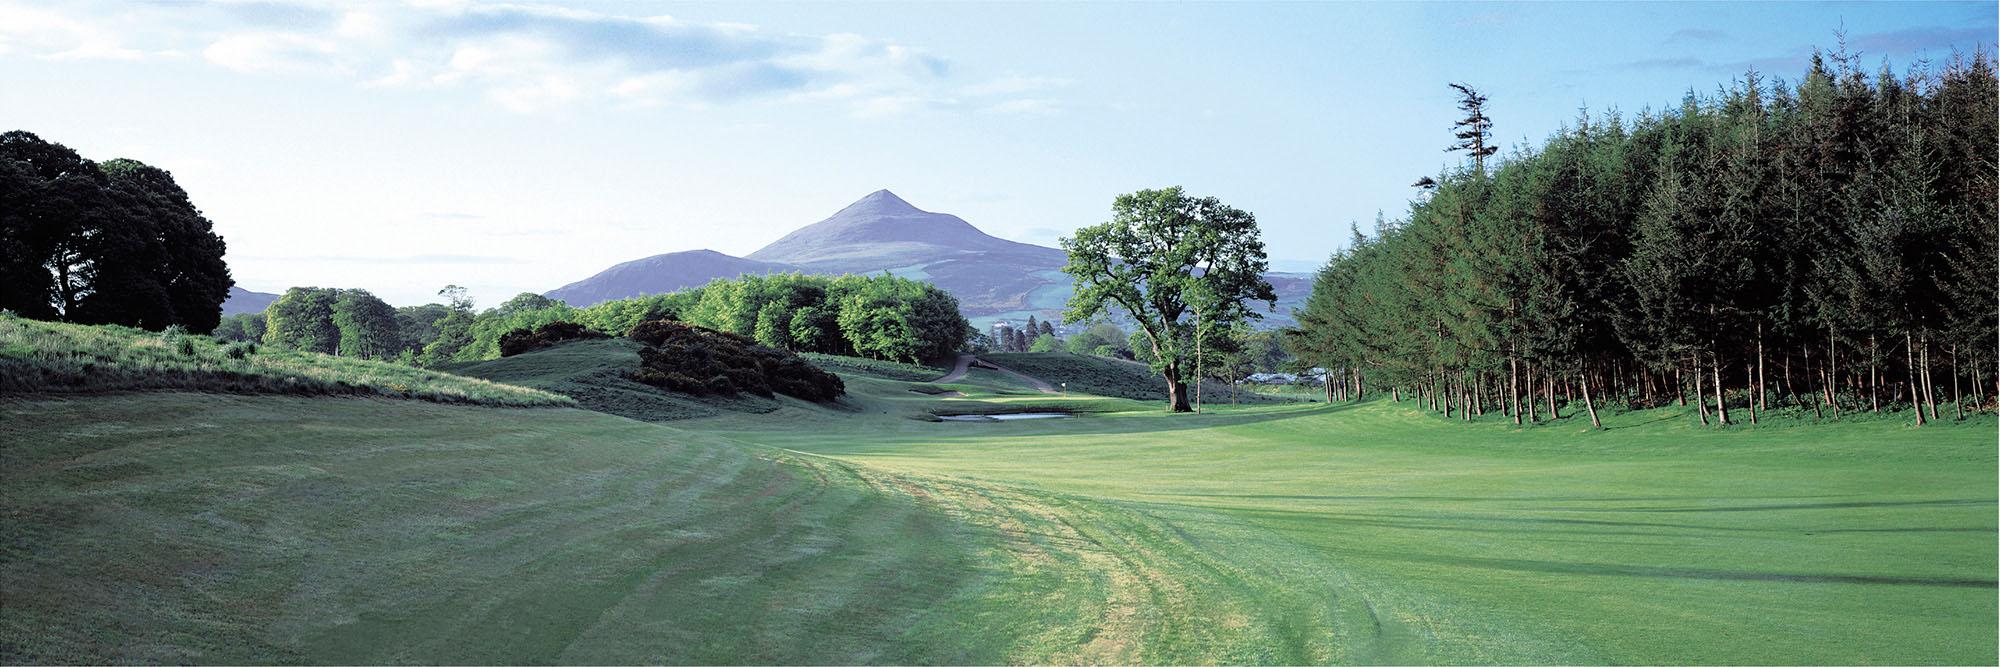 Golf Course Image - Powerscourt No. 17